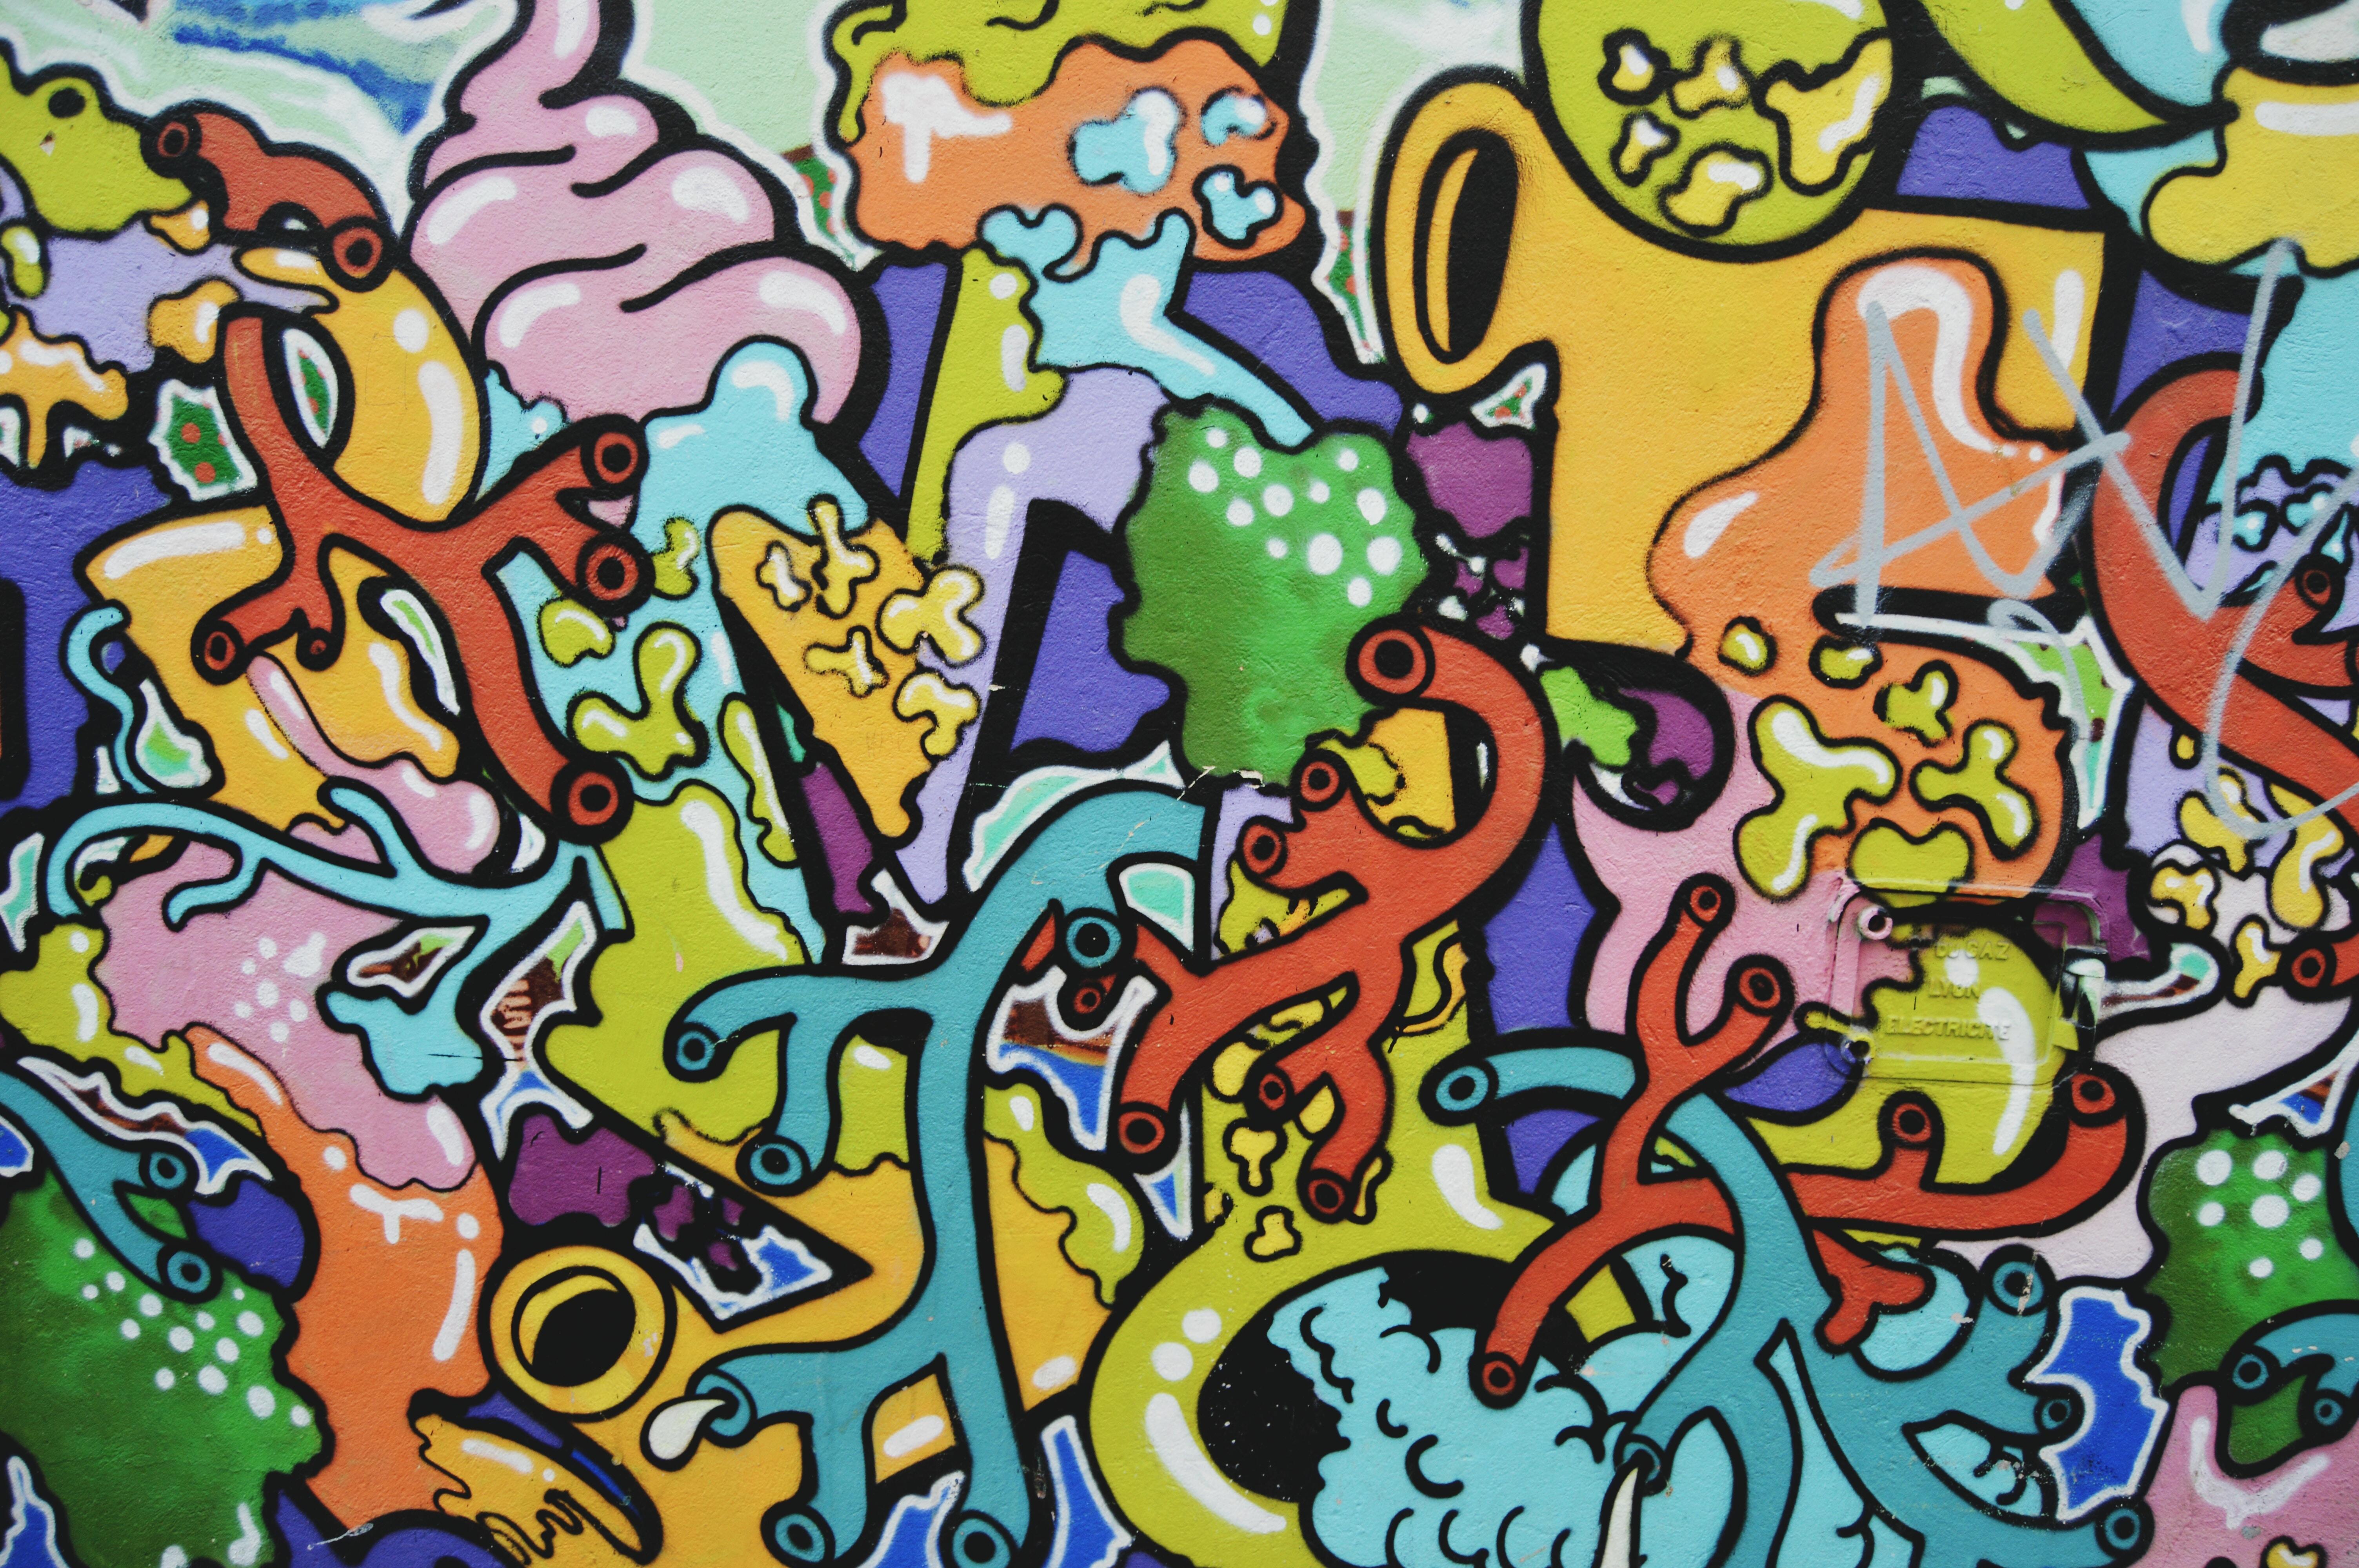 Colorful and random human organ street art in Lyon